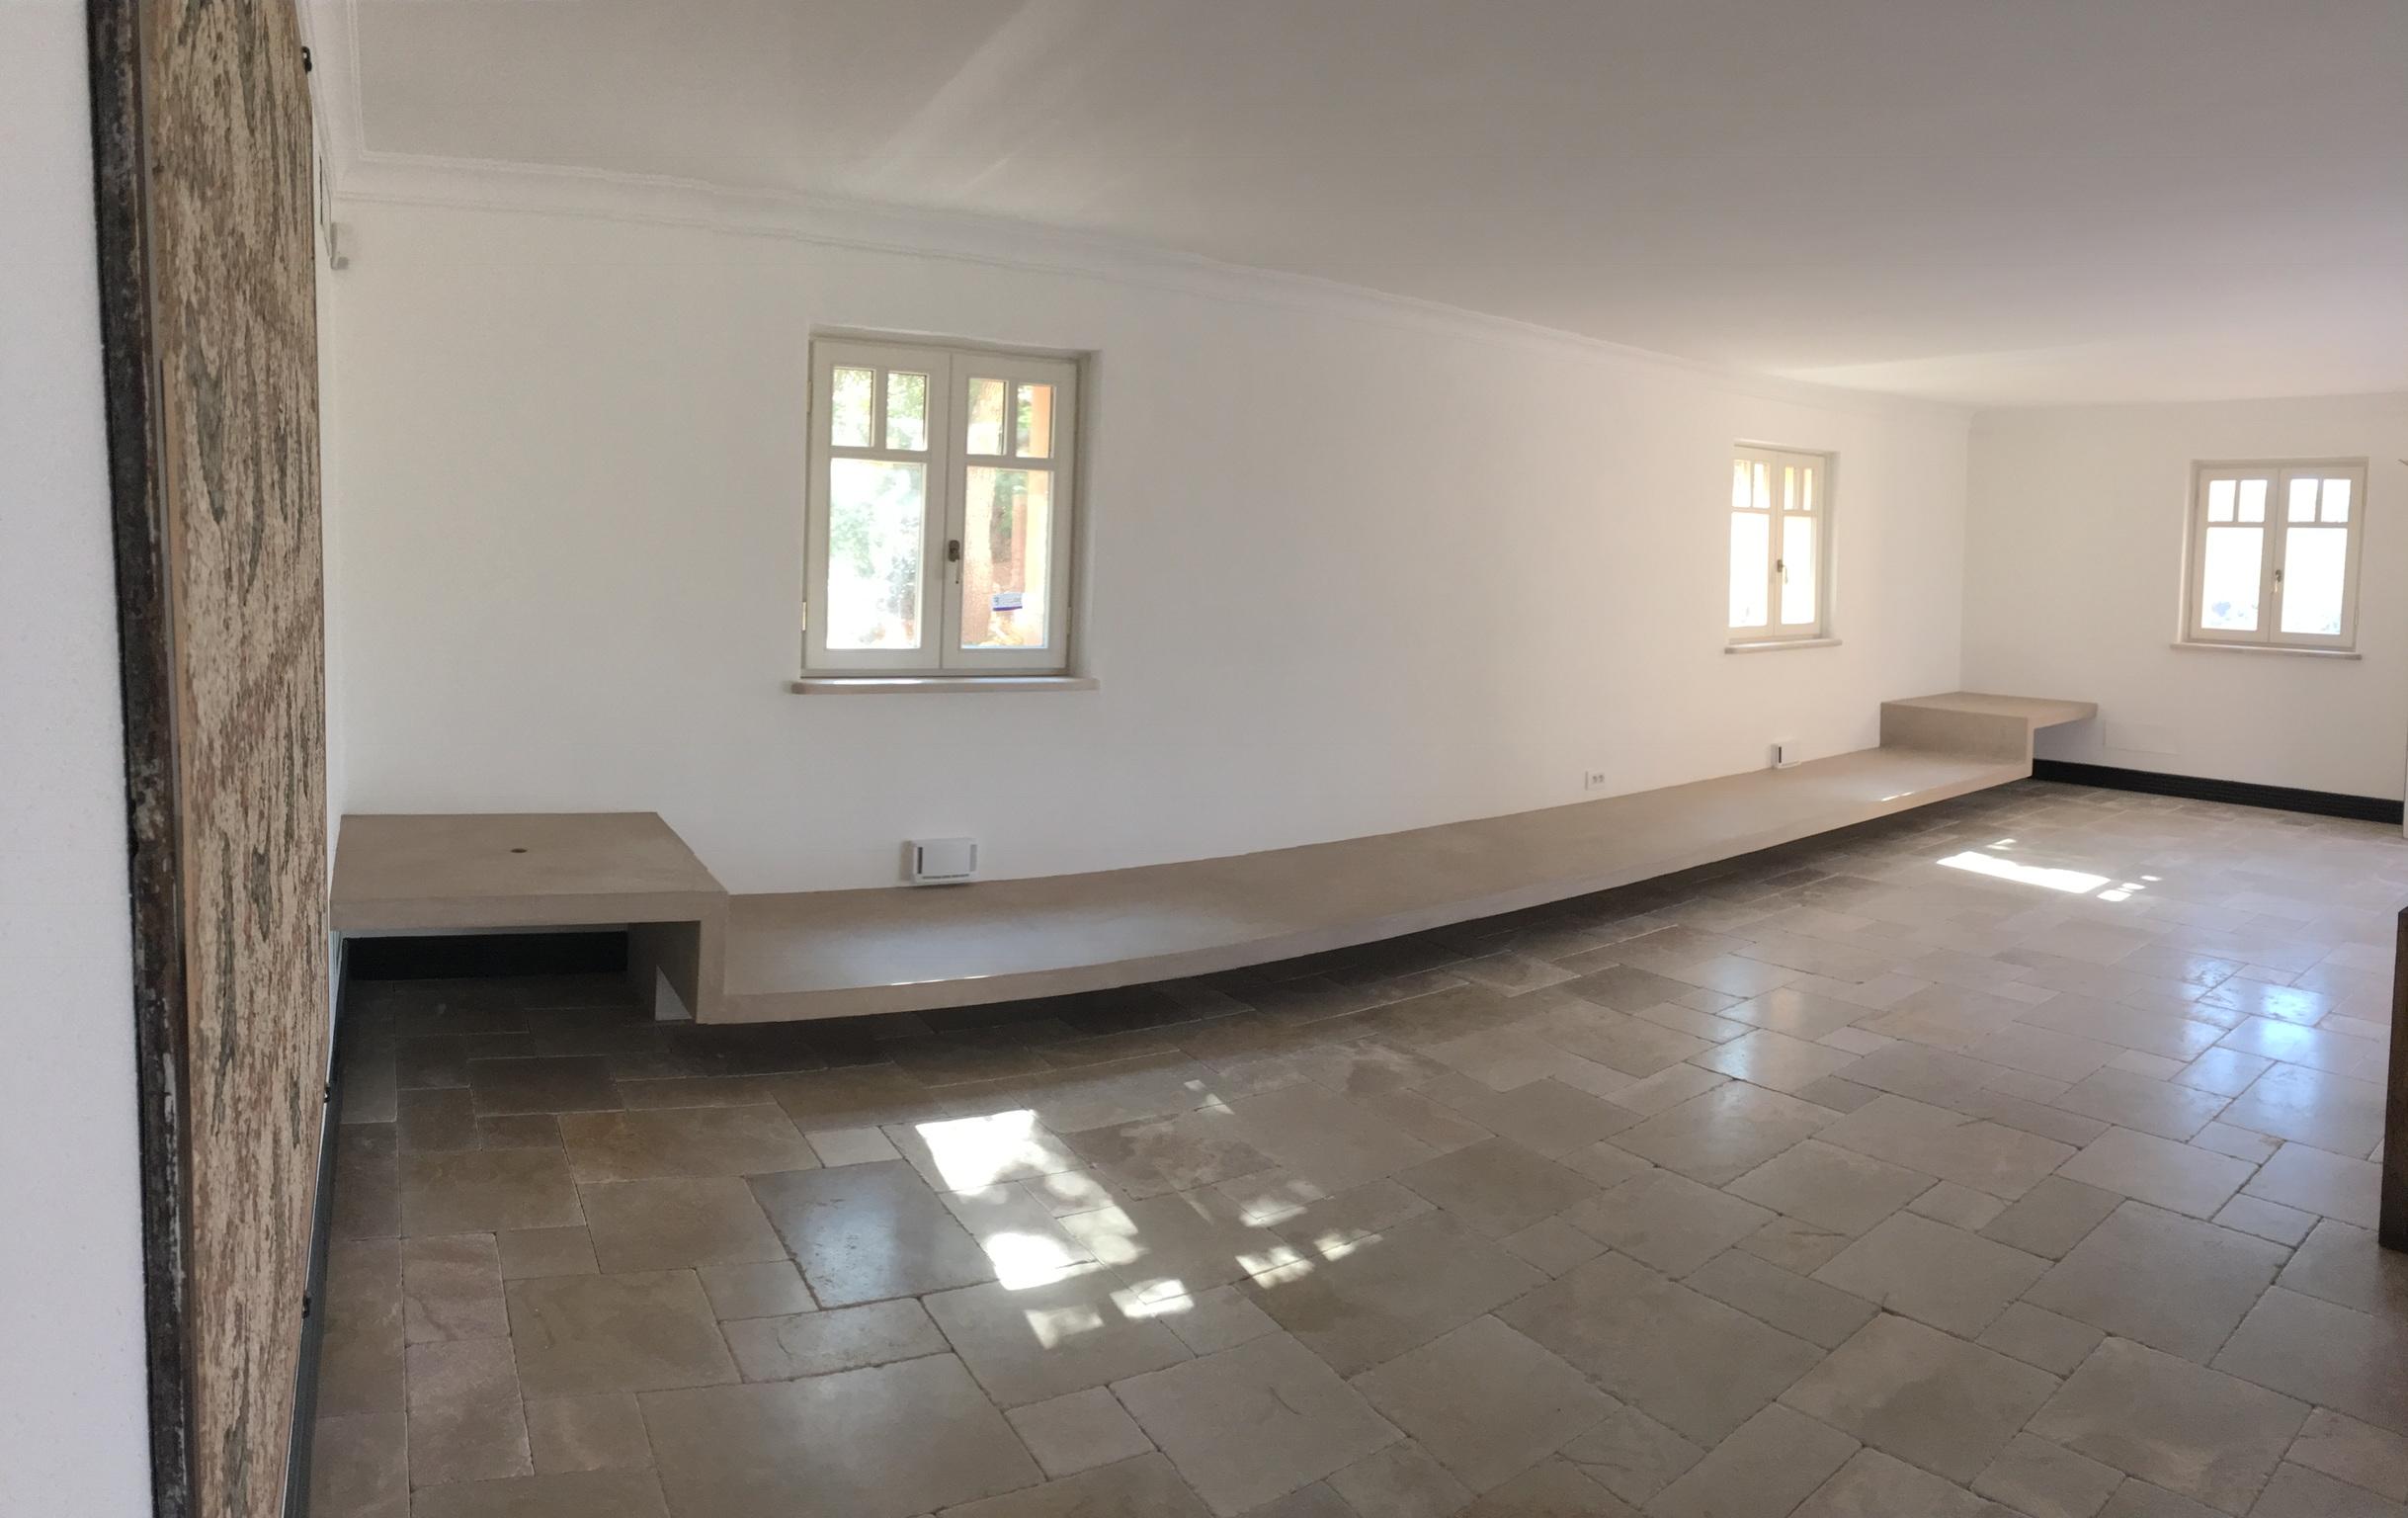 Meuble En Béton Ciré meubles en béton ciré - l'art.isan